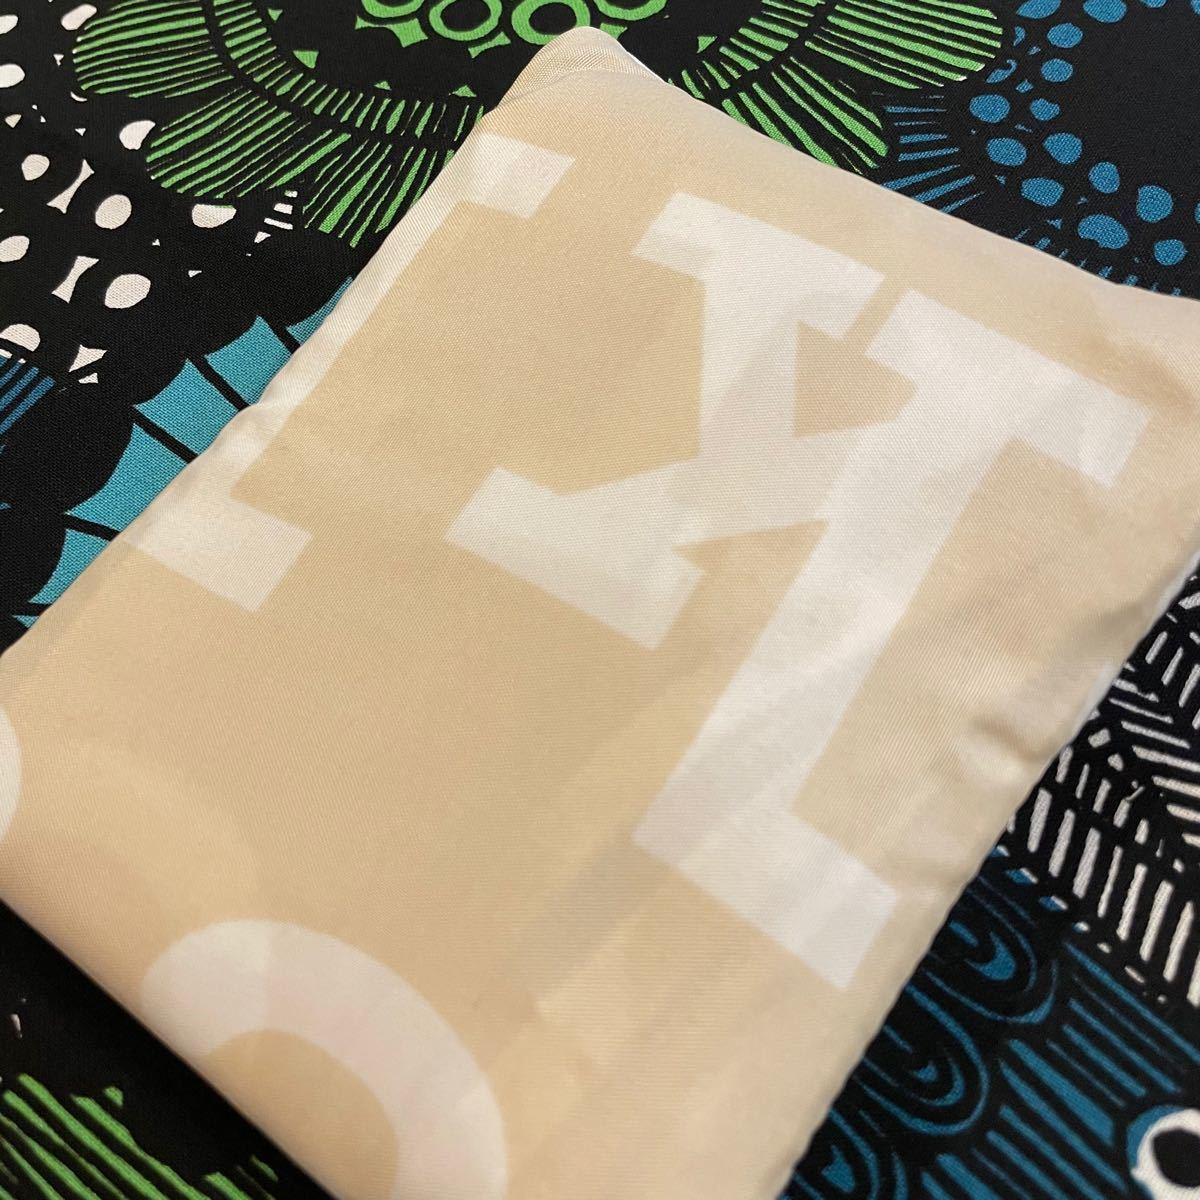 marimekko マリメッコ 新作 スマートバッグ+完売トートバッグ 新品